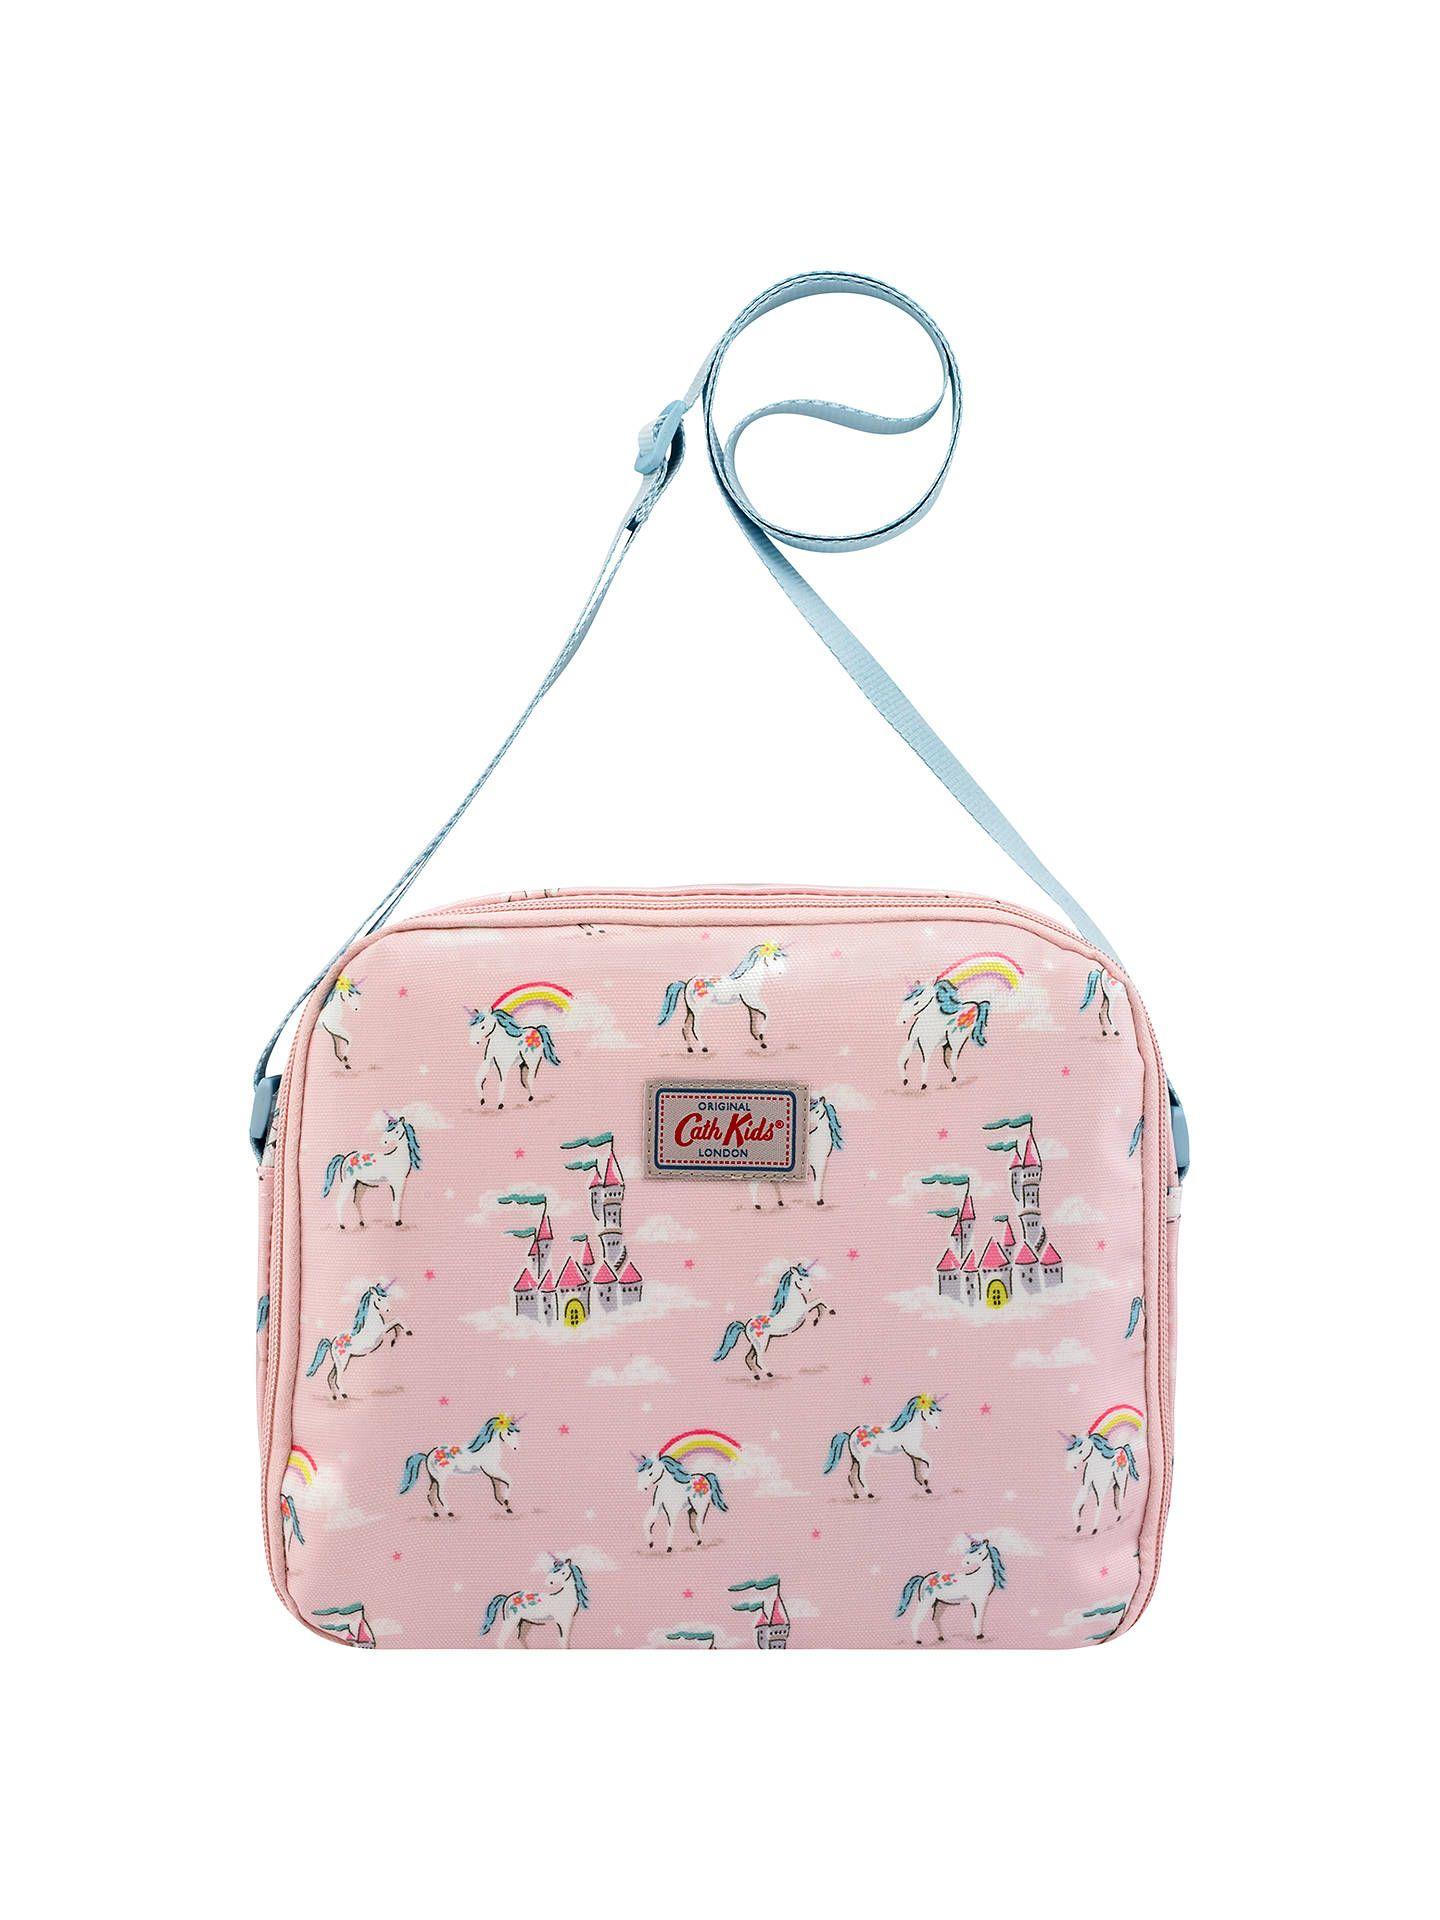 Cath Kidston Unicorn Ditsy Purse Light Pink